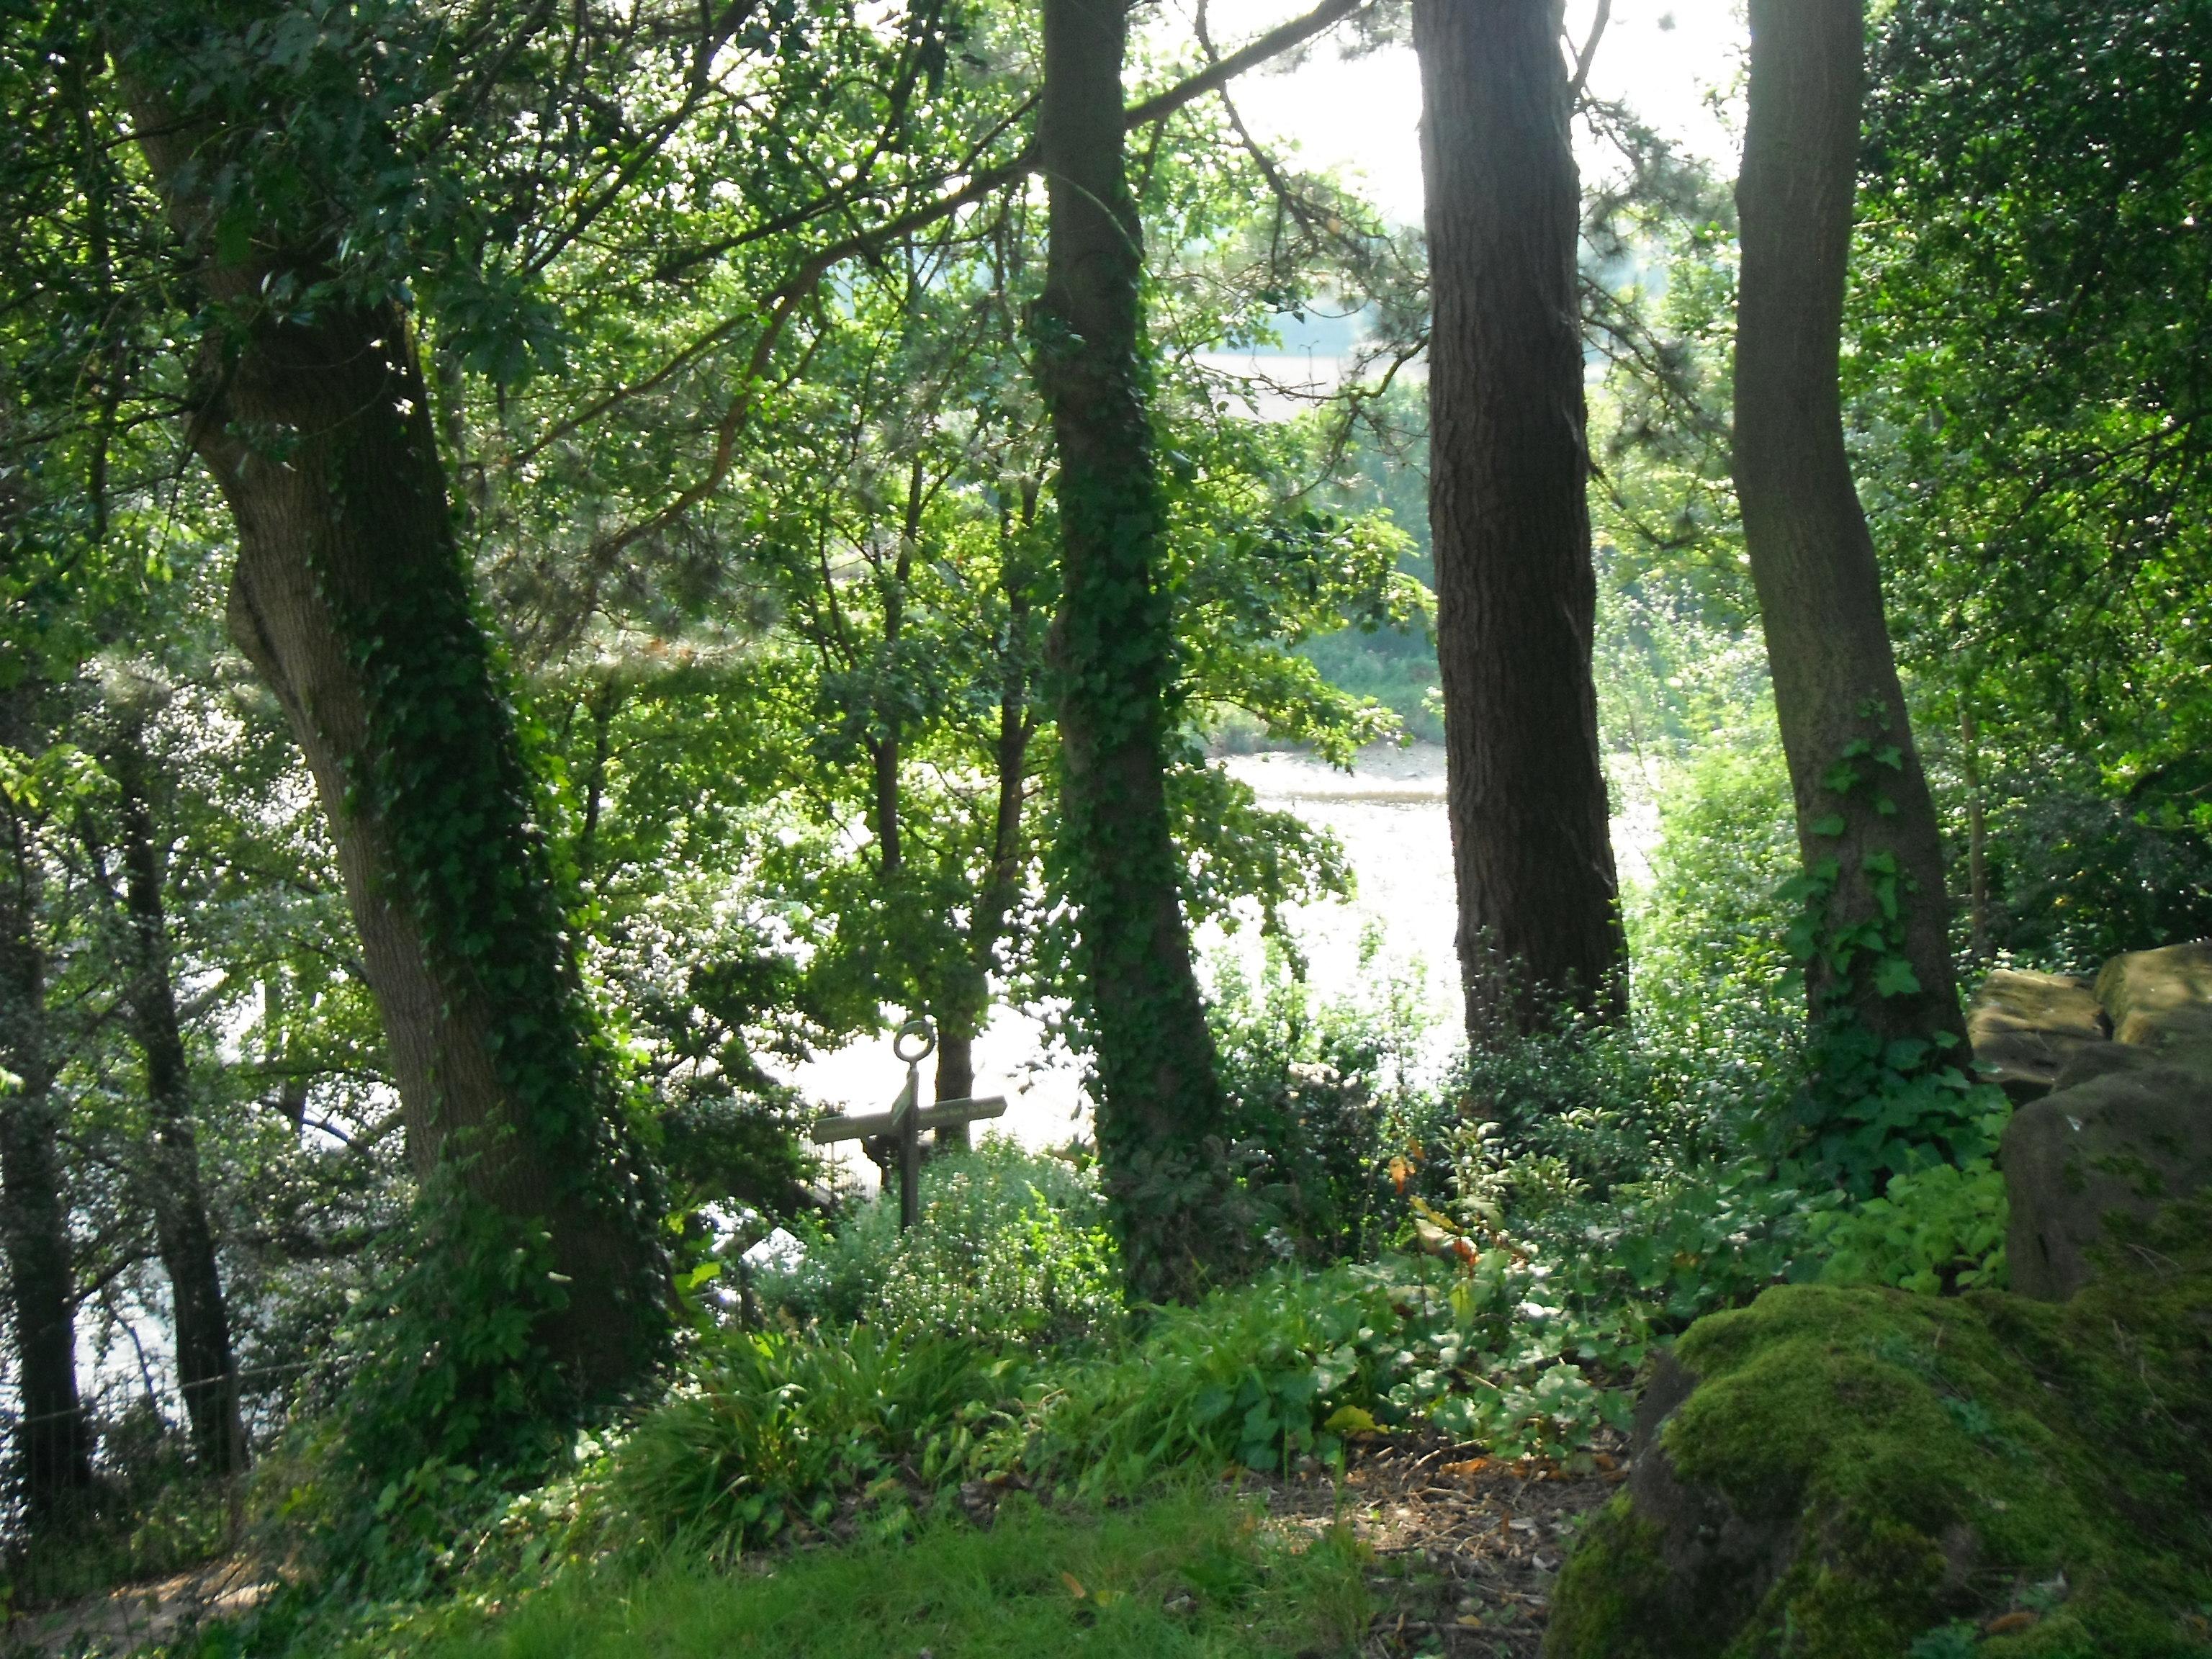 Preston's Avenham Park, taken by me